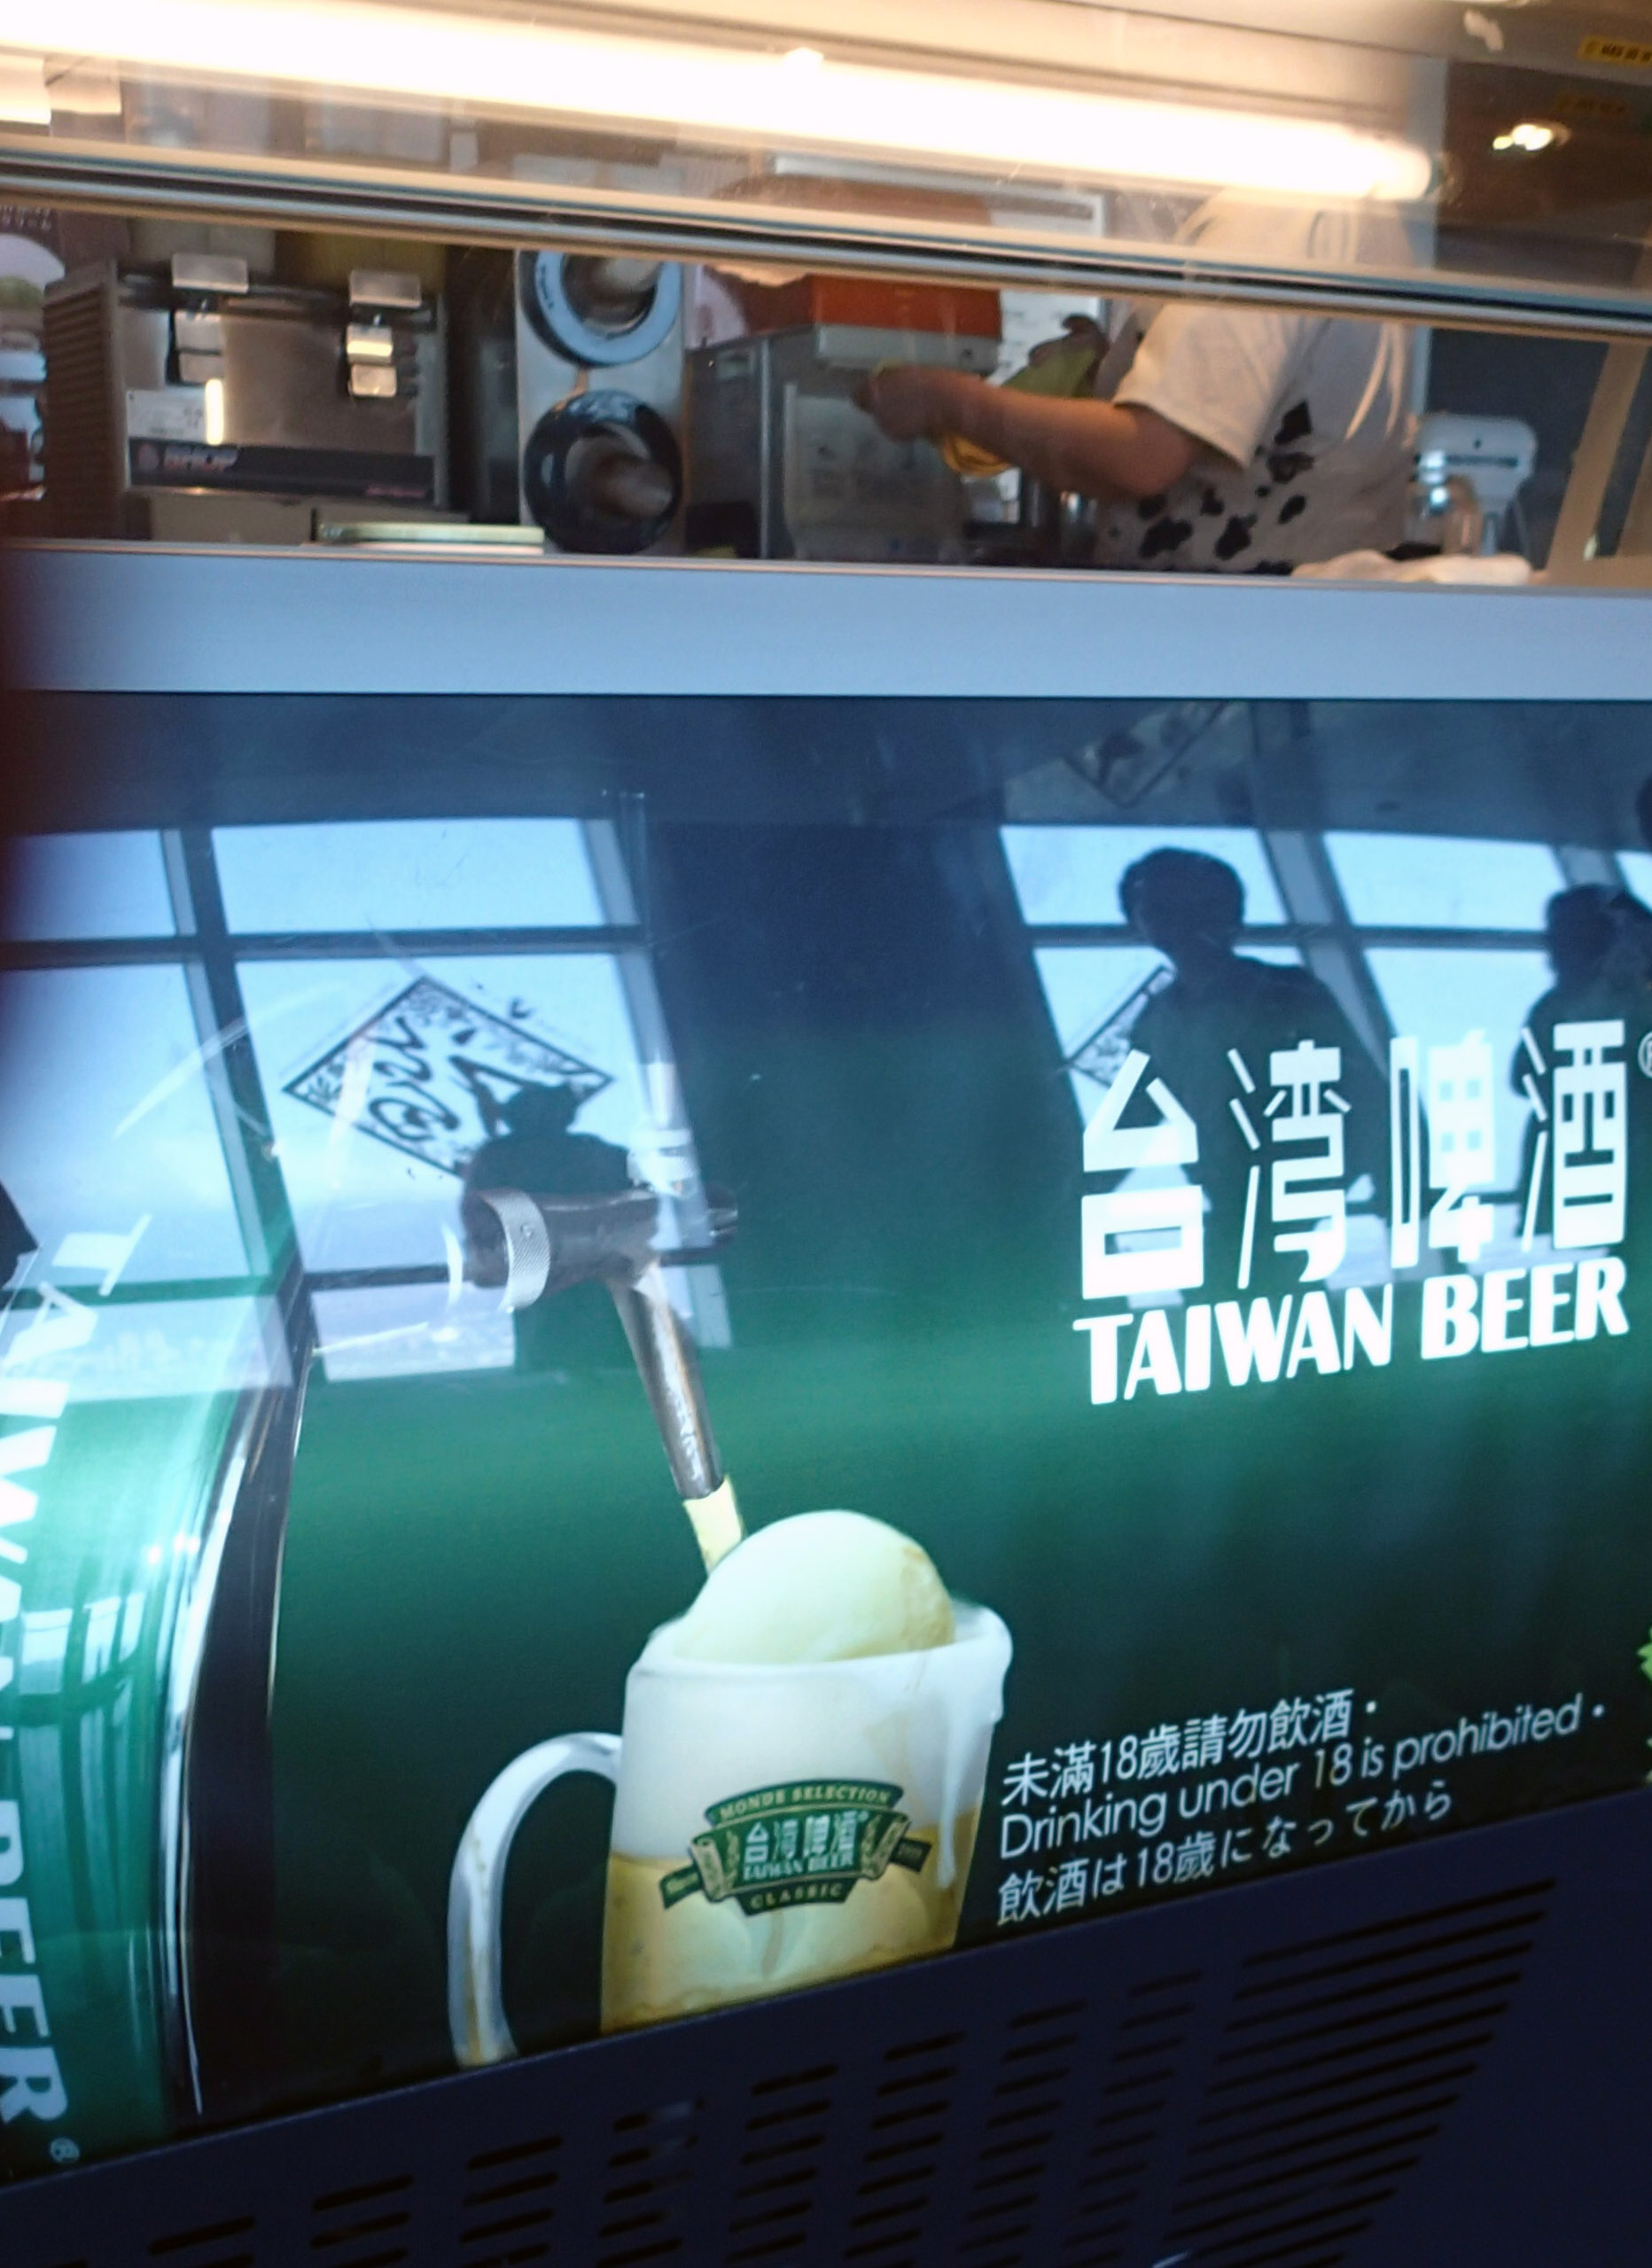 beer float=not great.jpg